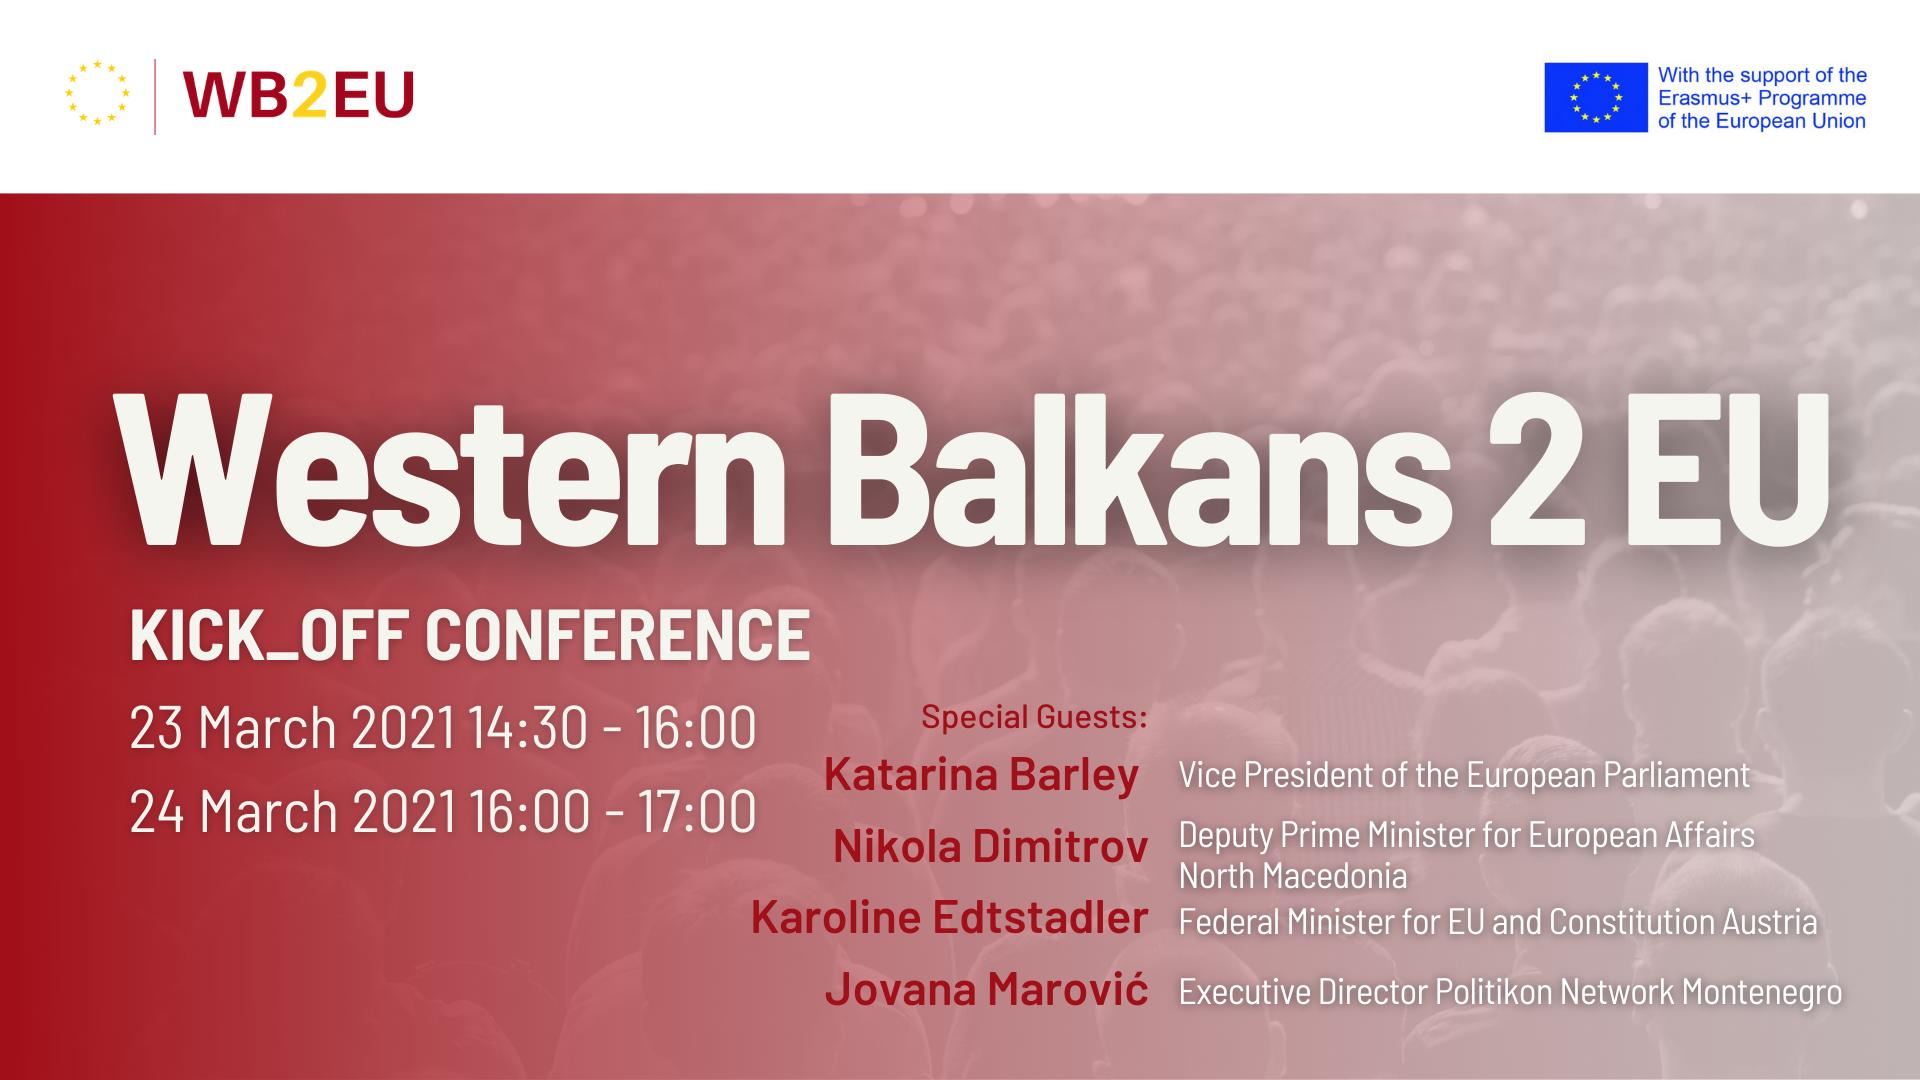 Kick_Off Conference Western Balkans 2 EU: A Reality Check for EU Enlargement